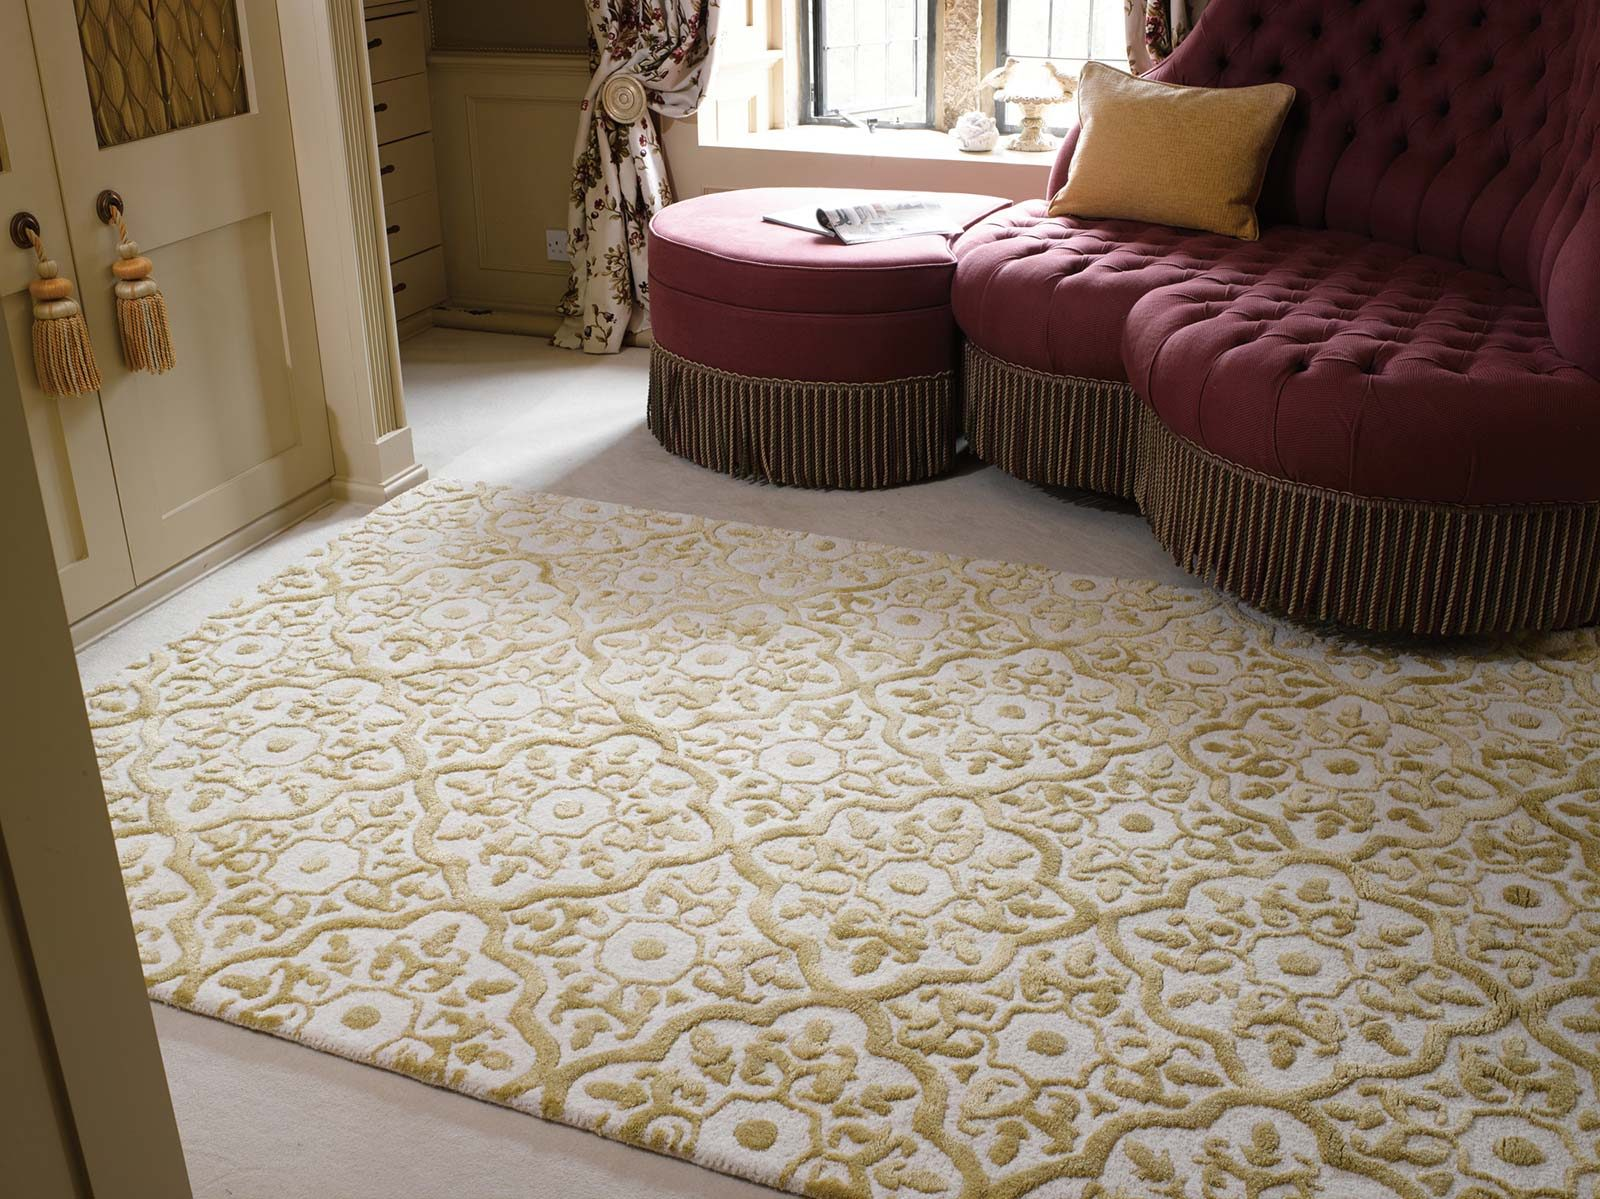 tapijt Luxmi Mayfair Knighsbridge Gold interior